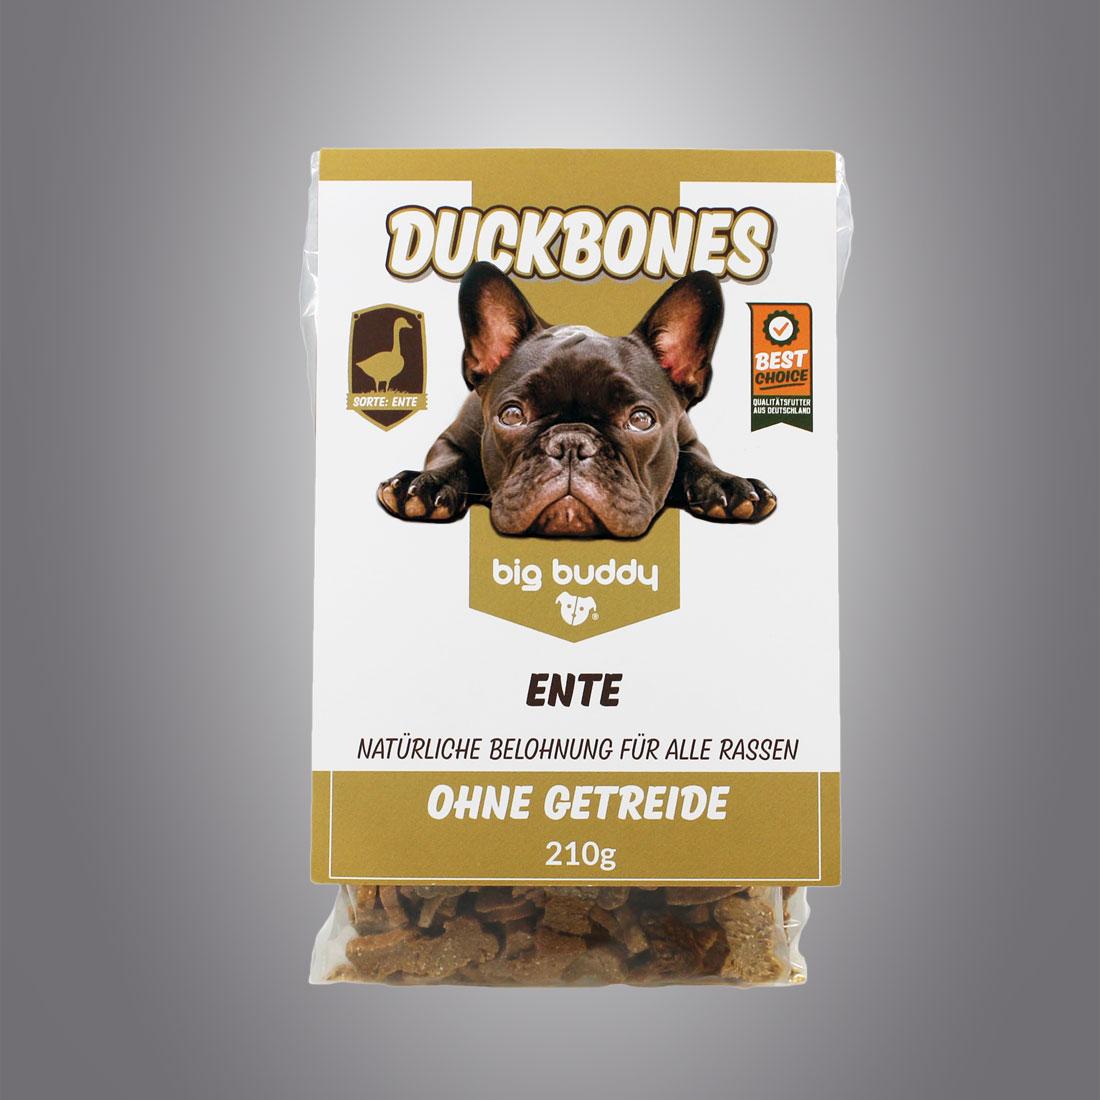 Big Buddy Duckbones